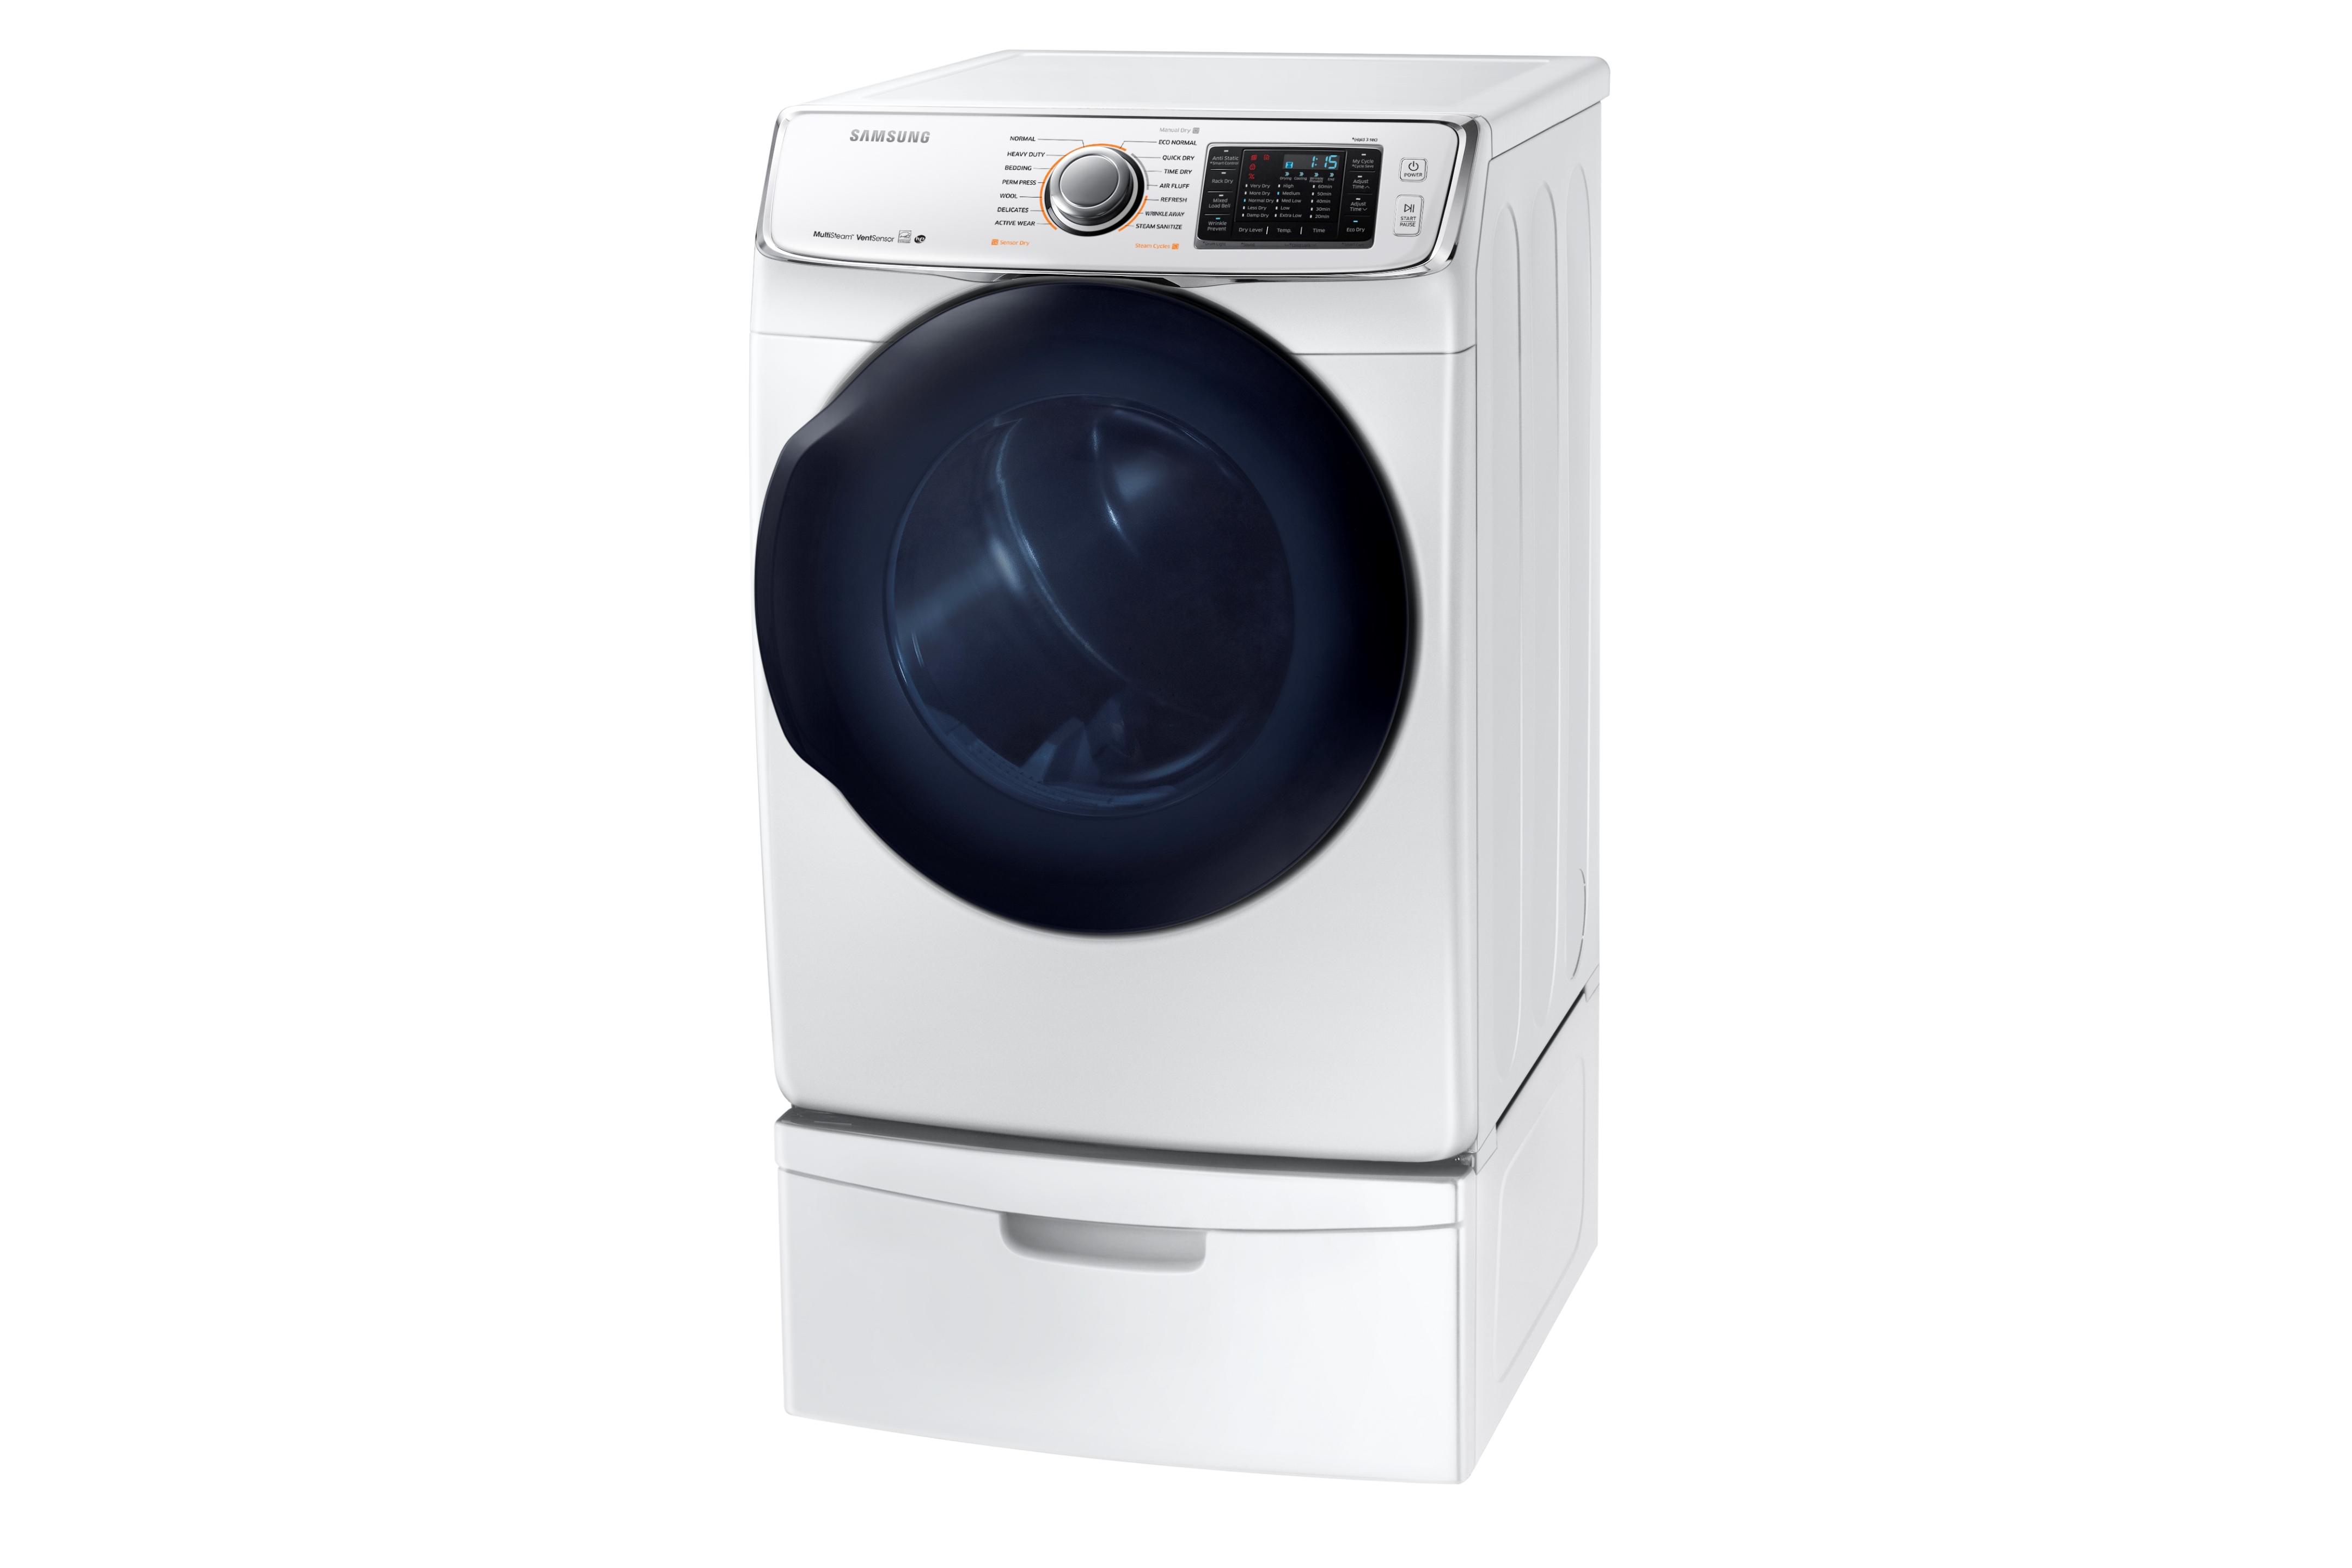 Samsung DV50K7500GW 7.5 cu. ft. Capacity Gas Dryer White